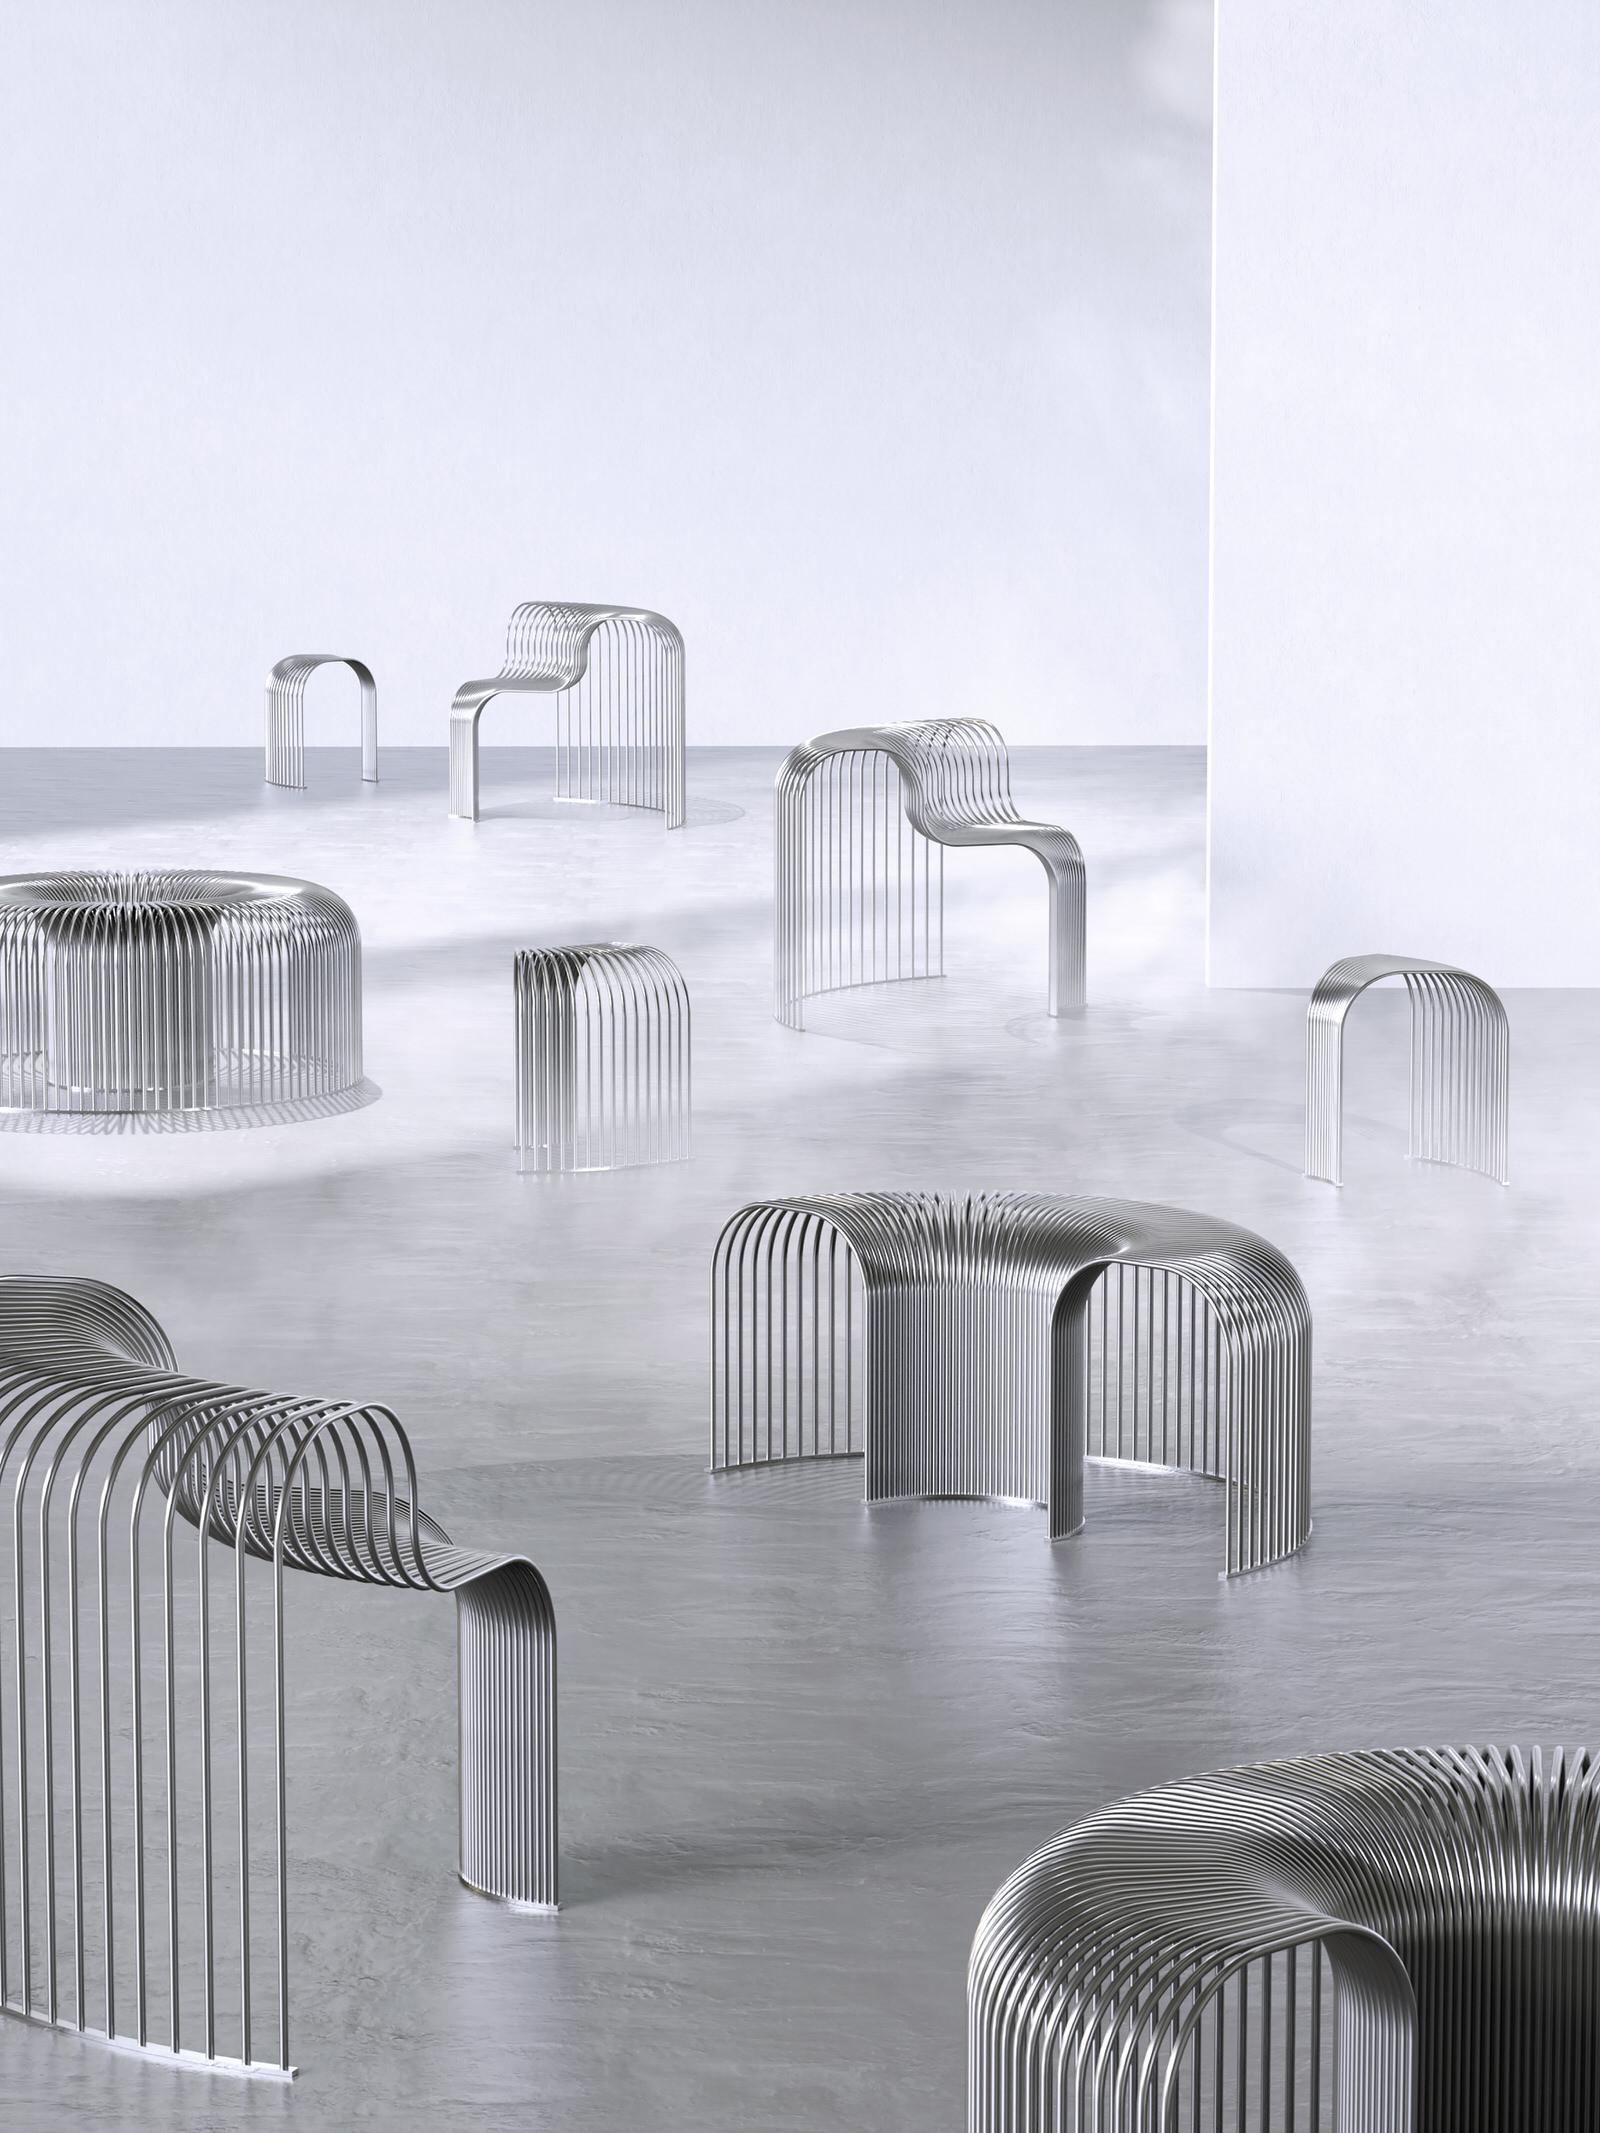 Josefin Zachrisson Mira Bergh Seats System Double Up Studio Yellowtrace 01